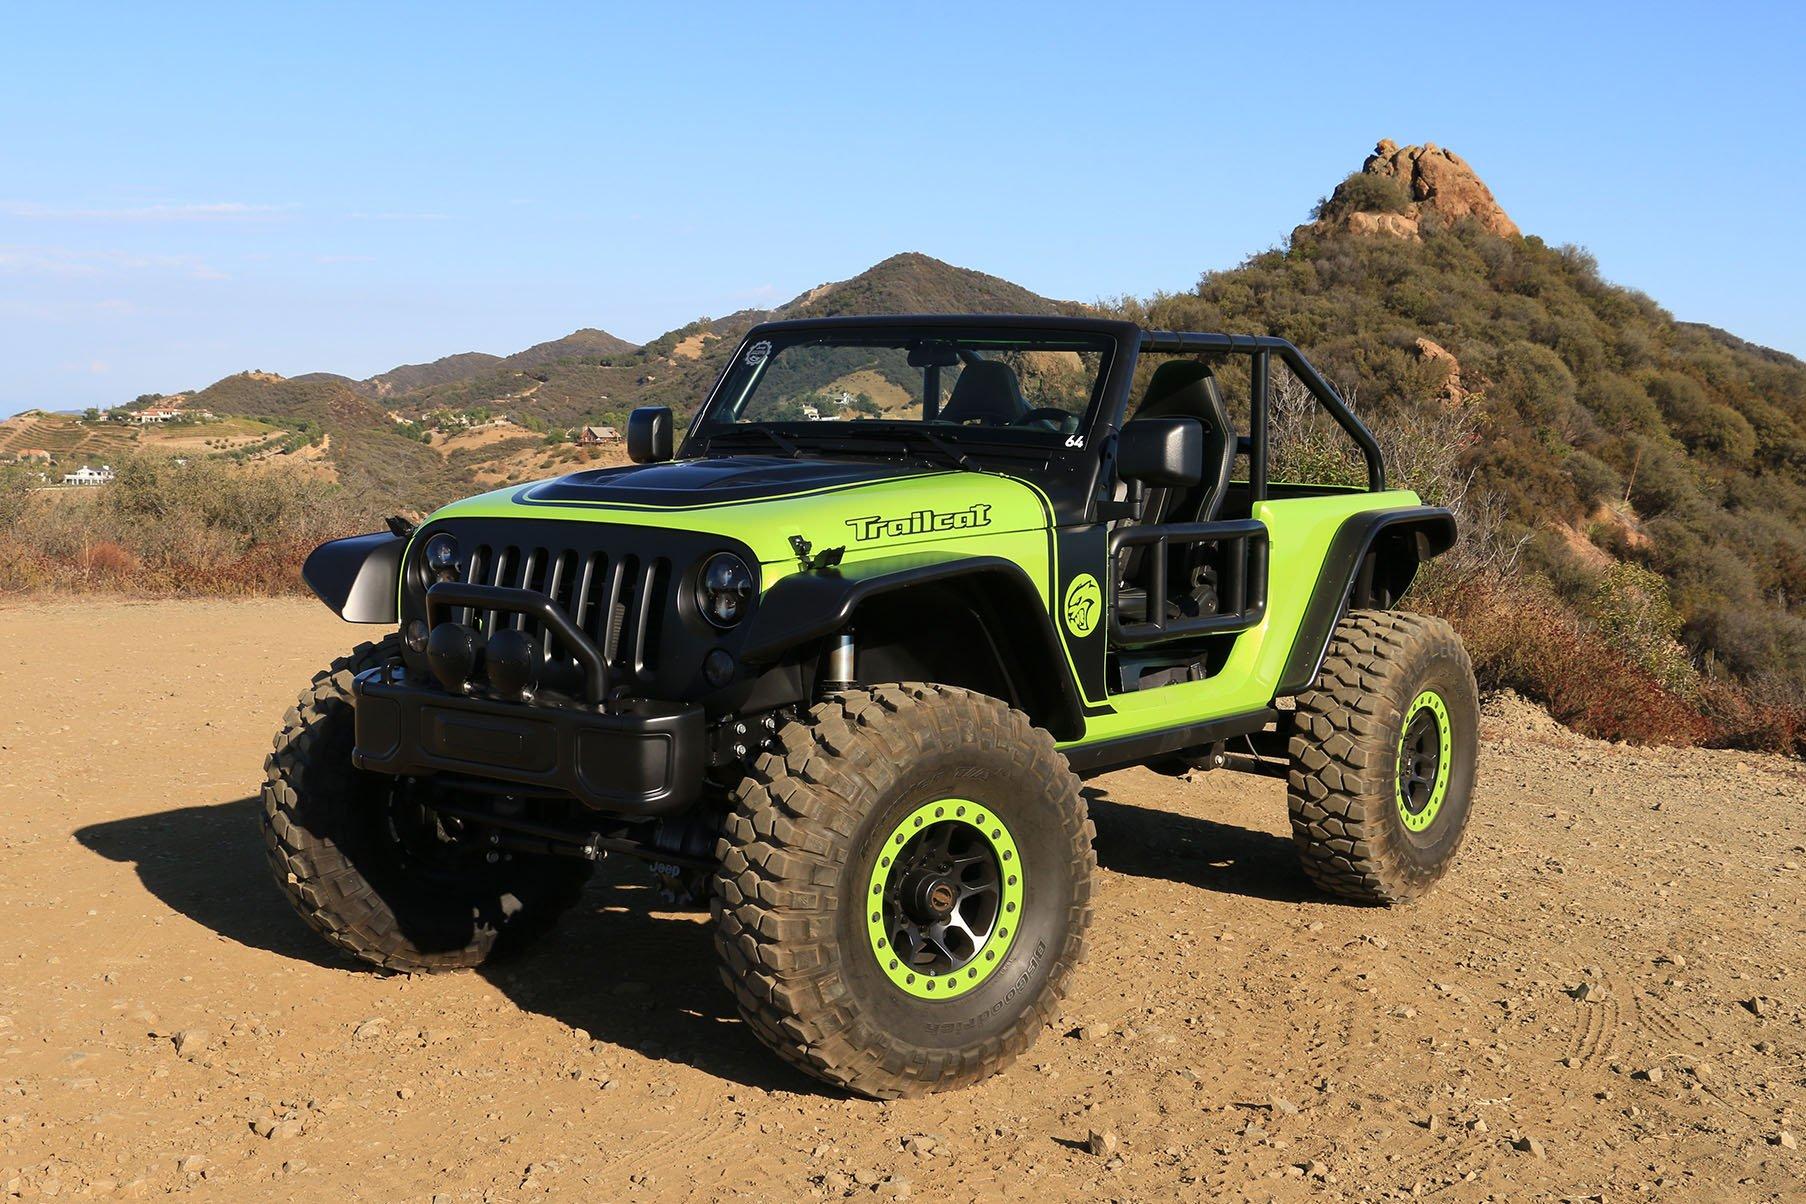 Jeep Trailcat featuring custom grille guard | www.blackhorse.com